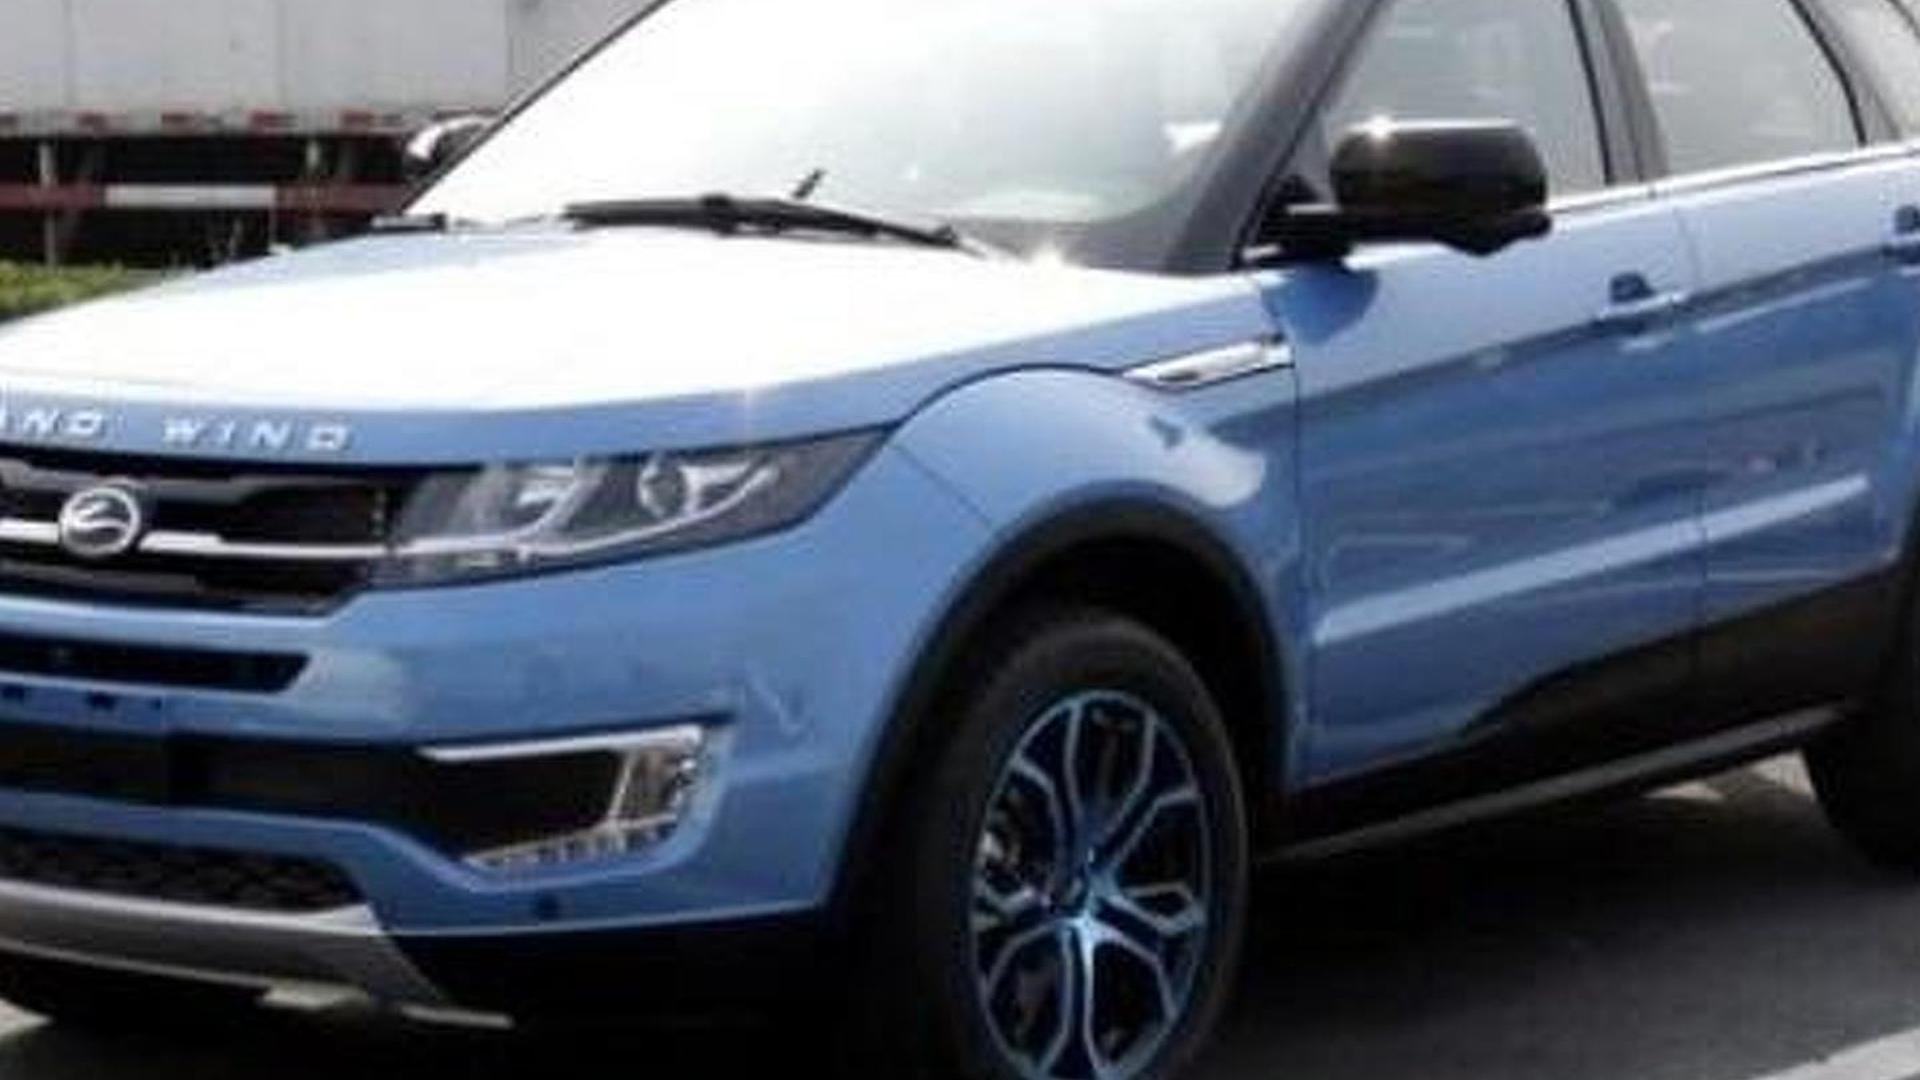 land rover range rover evoque News and Opinion